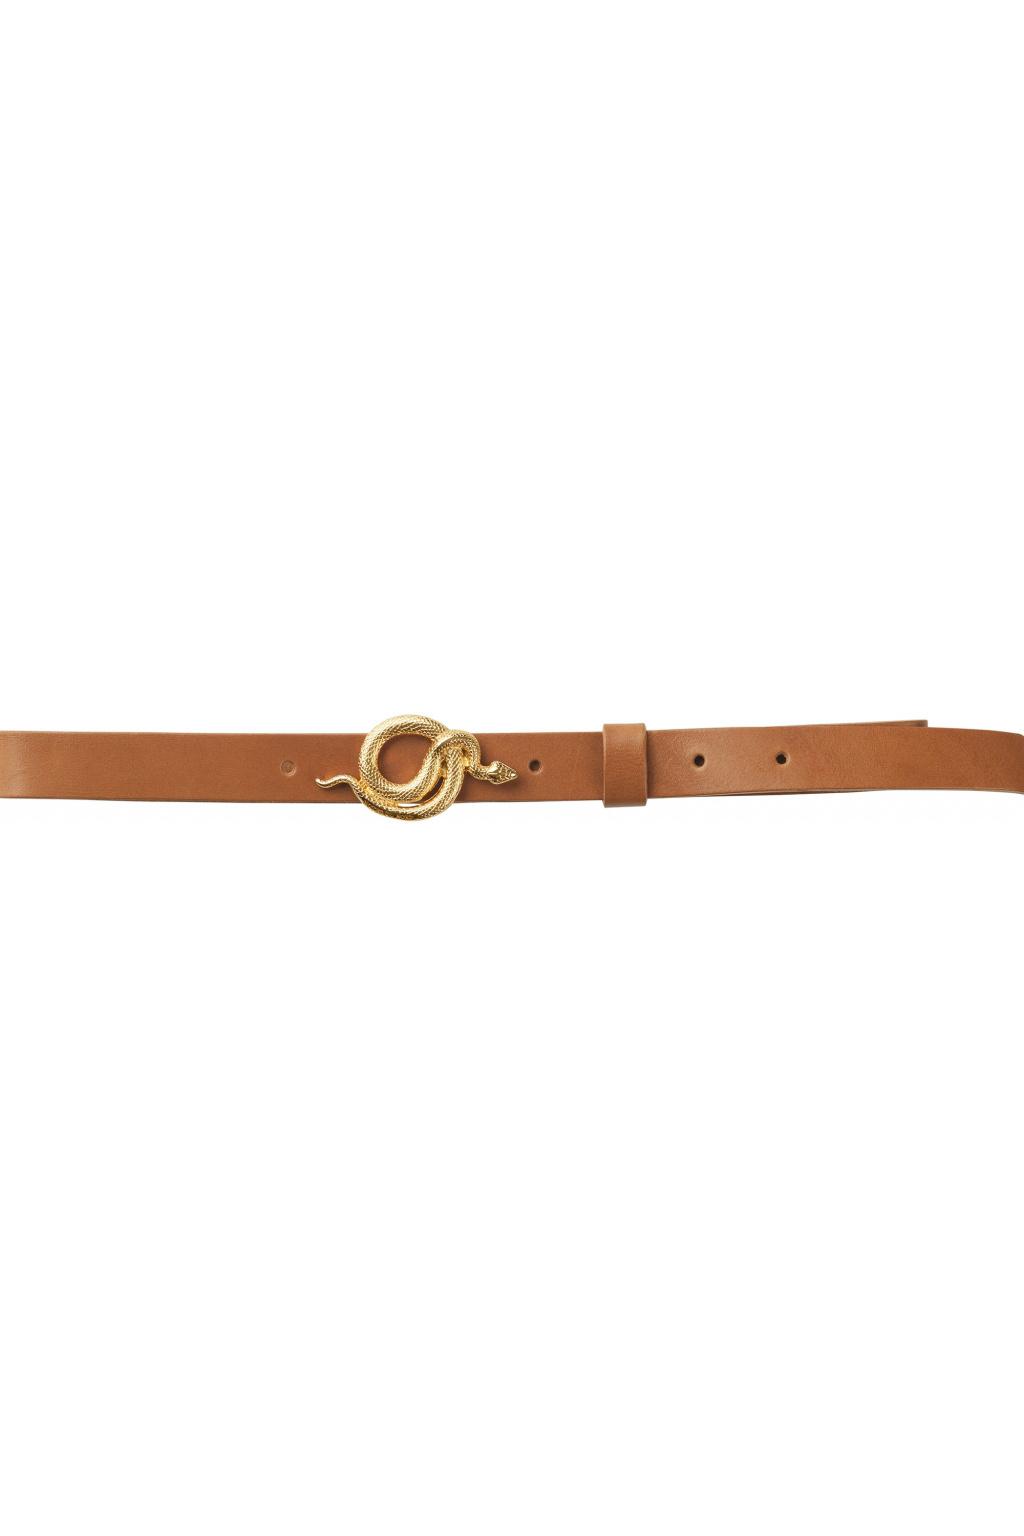 Paxton Leather Belt - Cognac / Gold-1